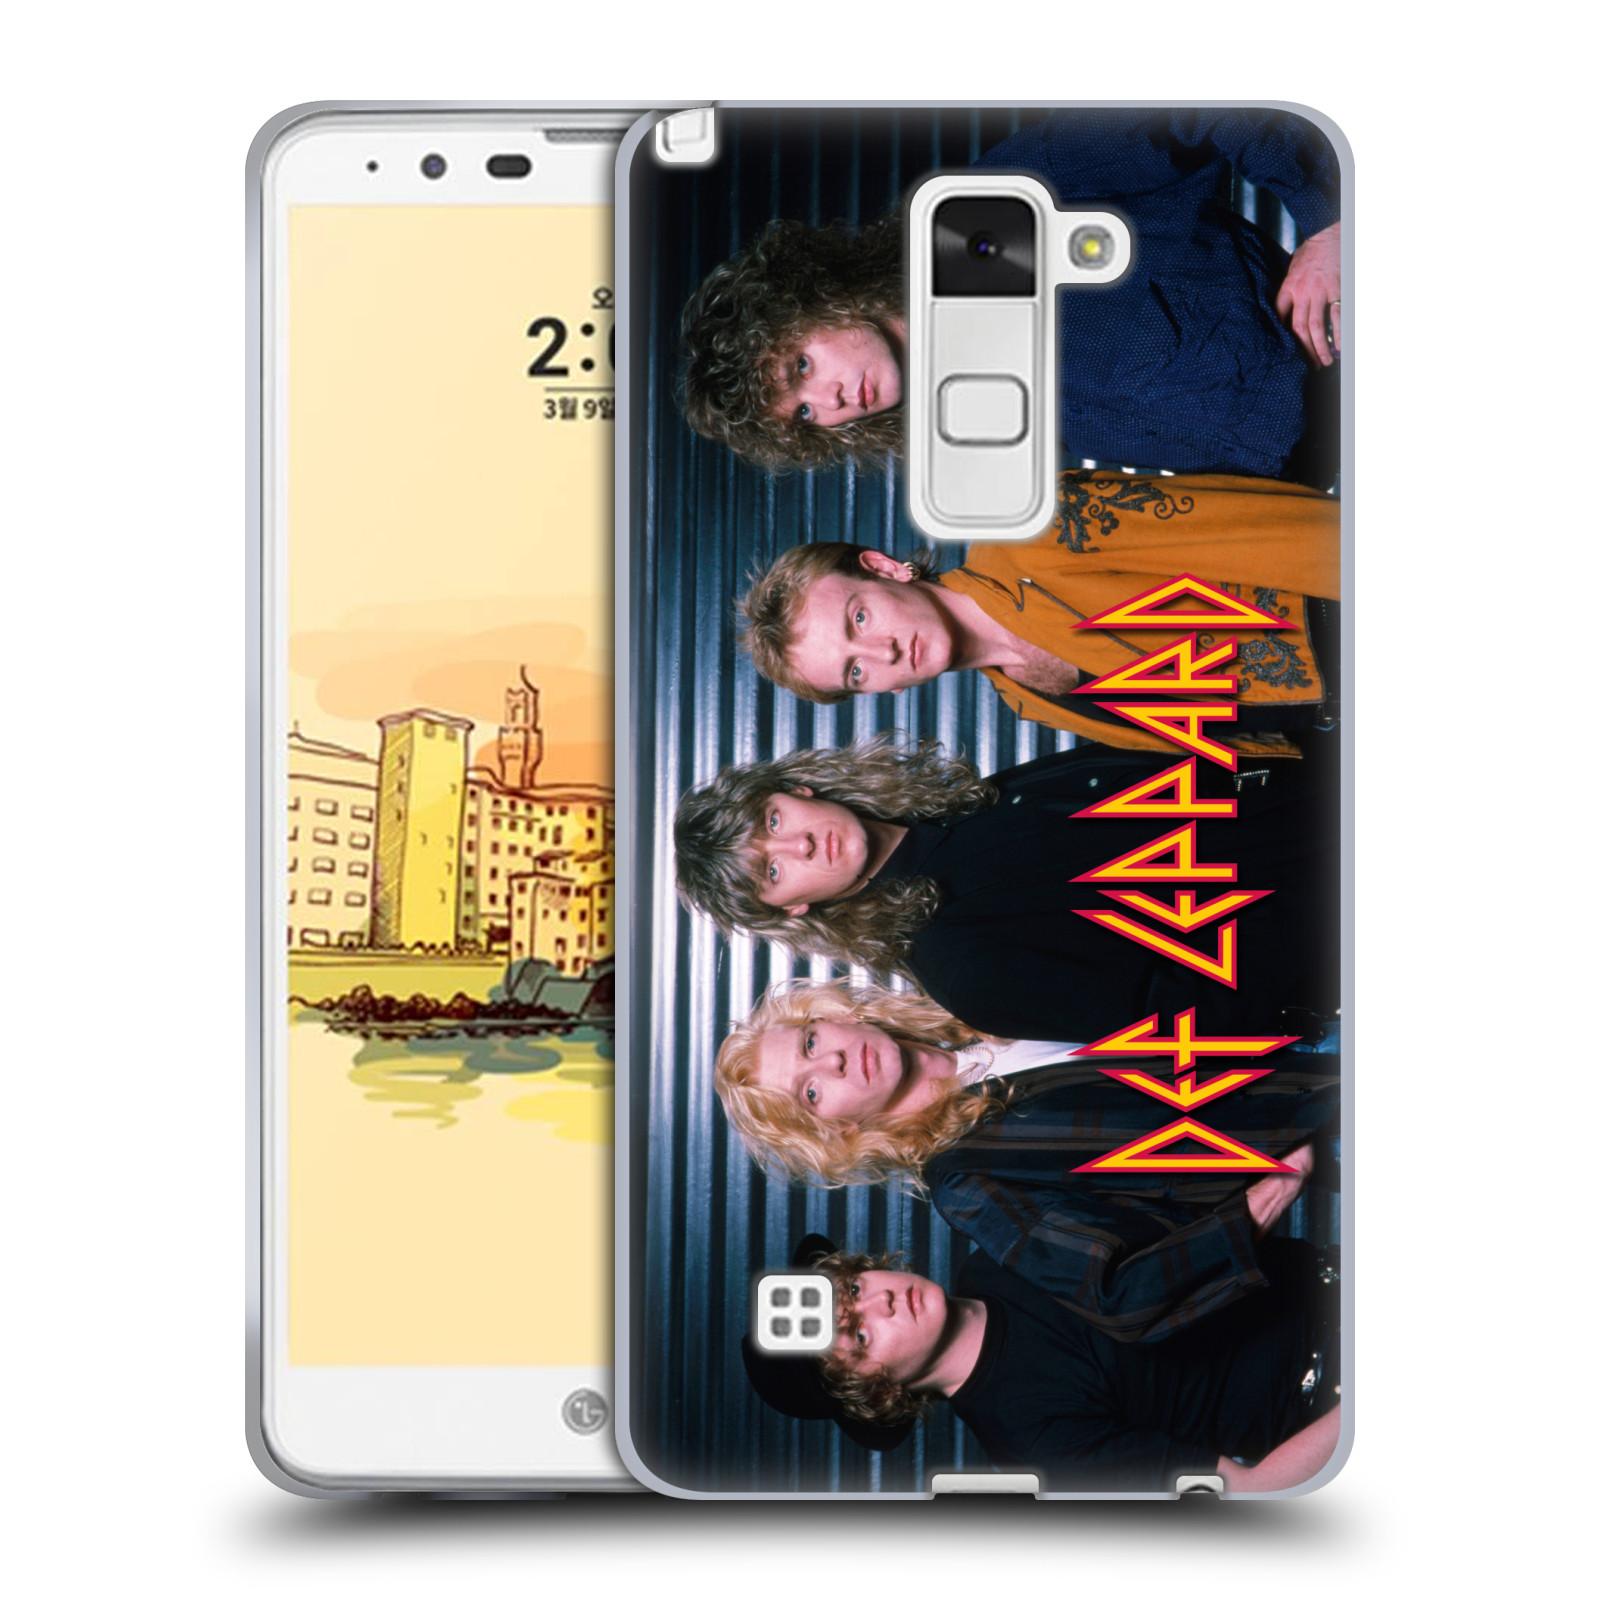 OFFICIAL-DEF-LEPPARD-PHOTOS-SOFT-GEL-CASE-FOR-LG-PHONES-3